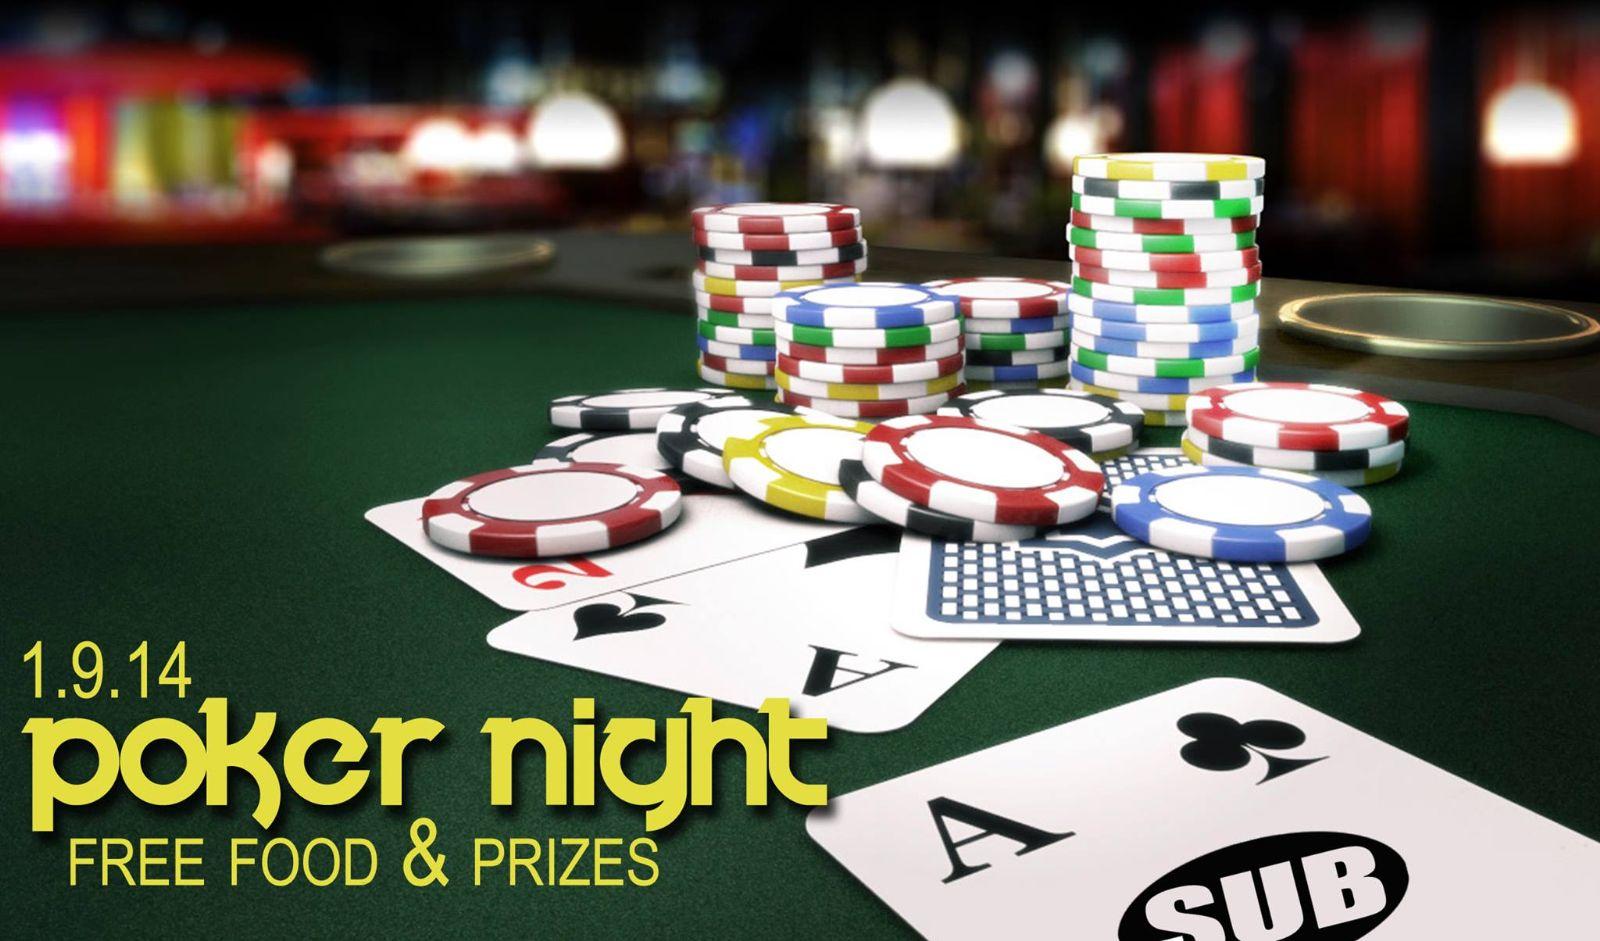 Casino lausanne poker fitzgerald casino and resort